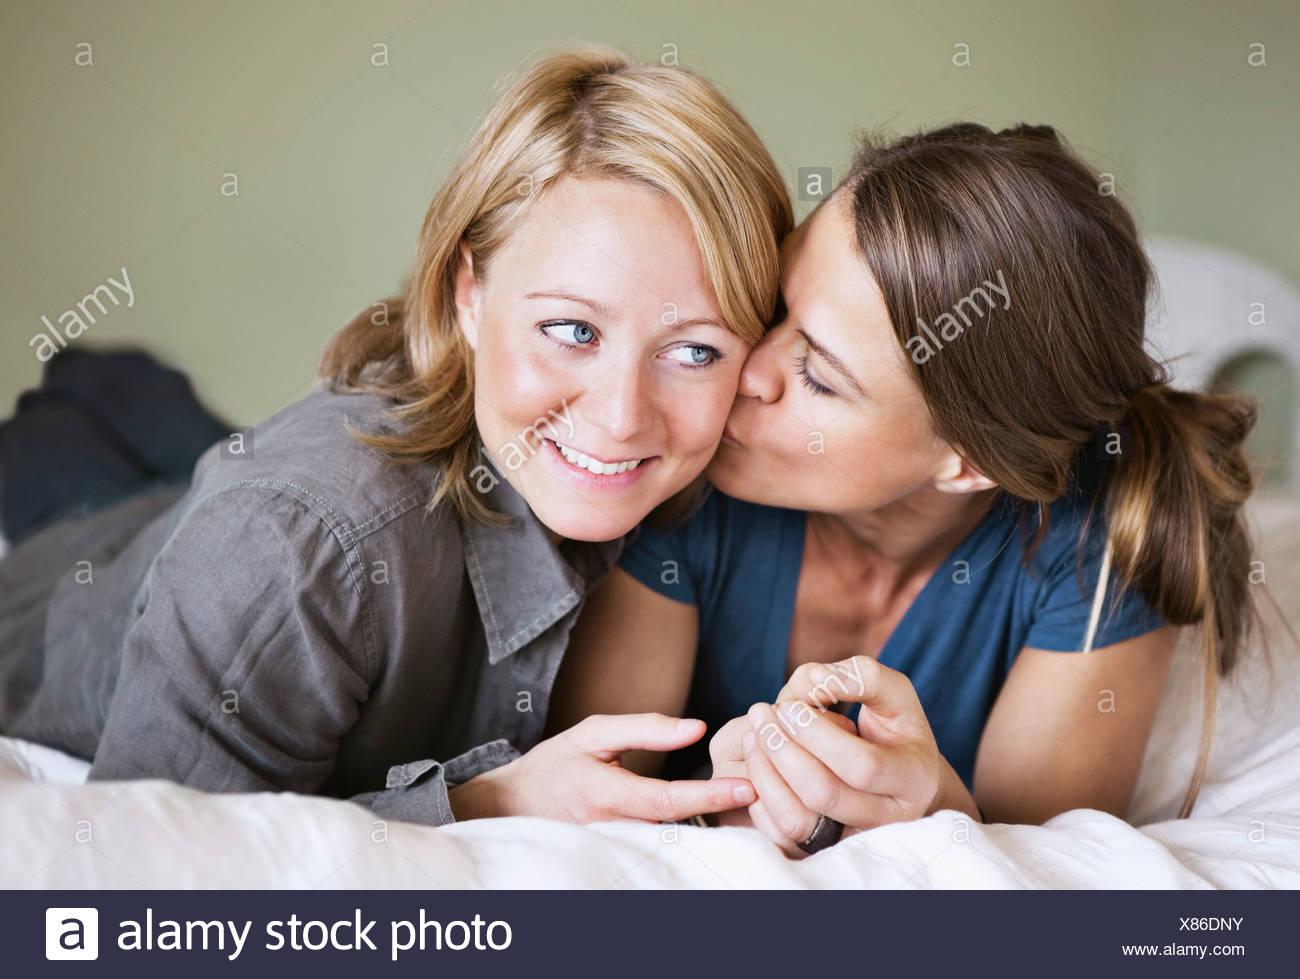 Girlfriends cuddle - Stock Image